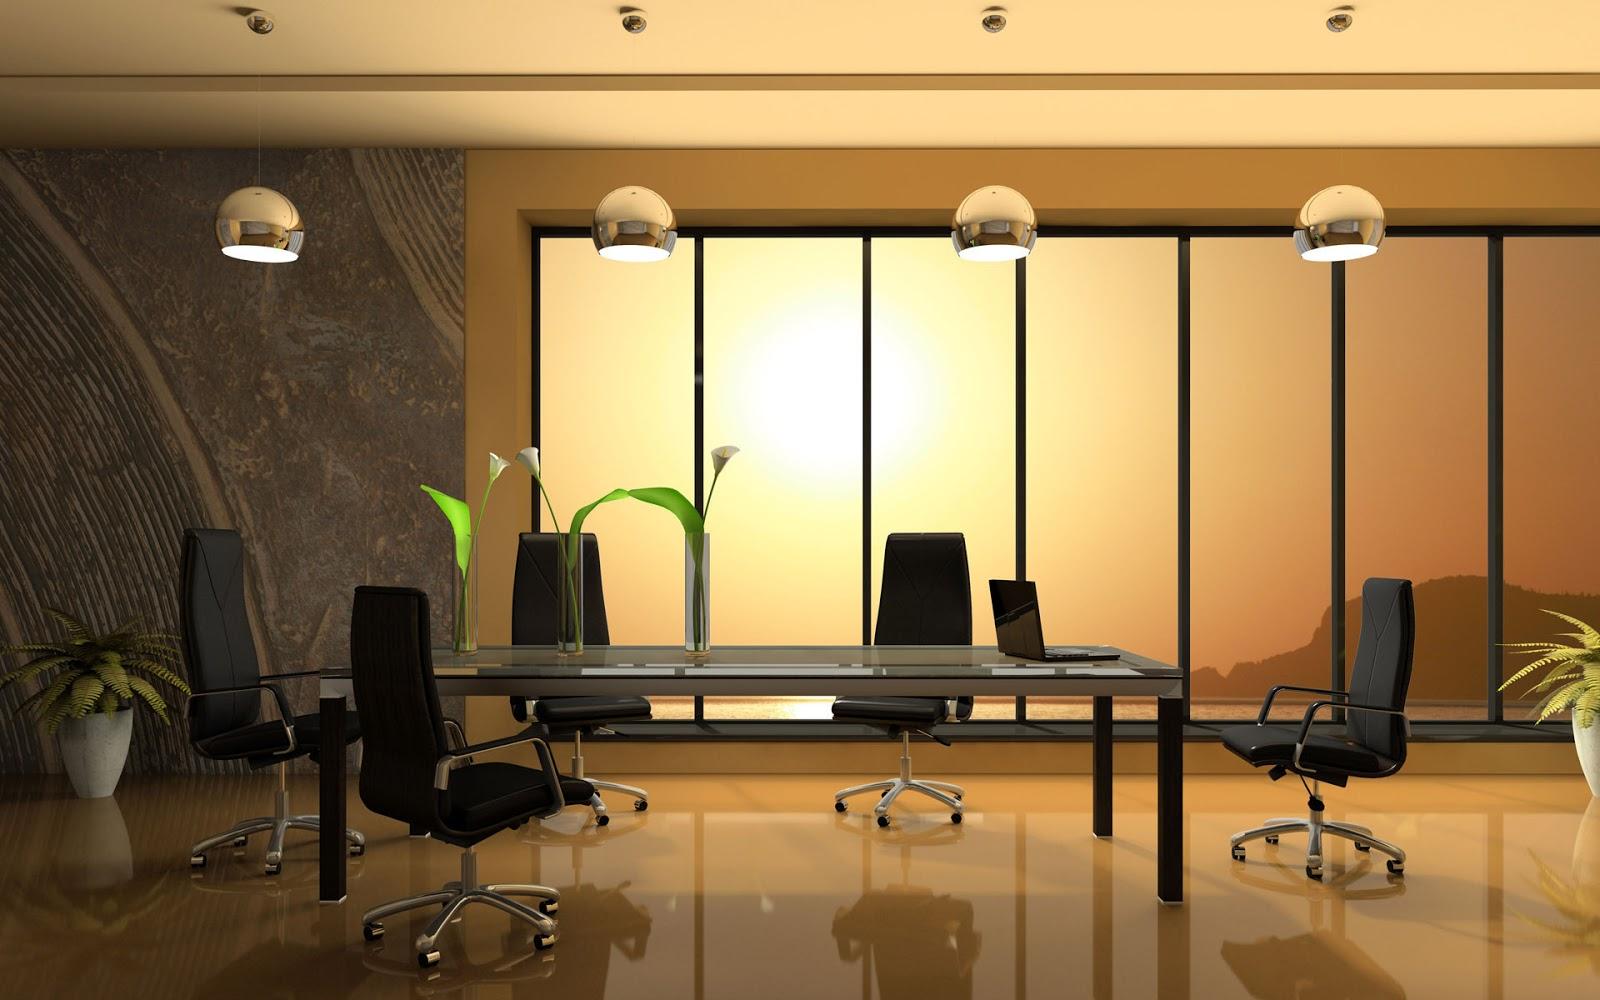 Fresh HD Wallpapers Interior Design Fresh HD Wallpapers 2013 1600x1000